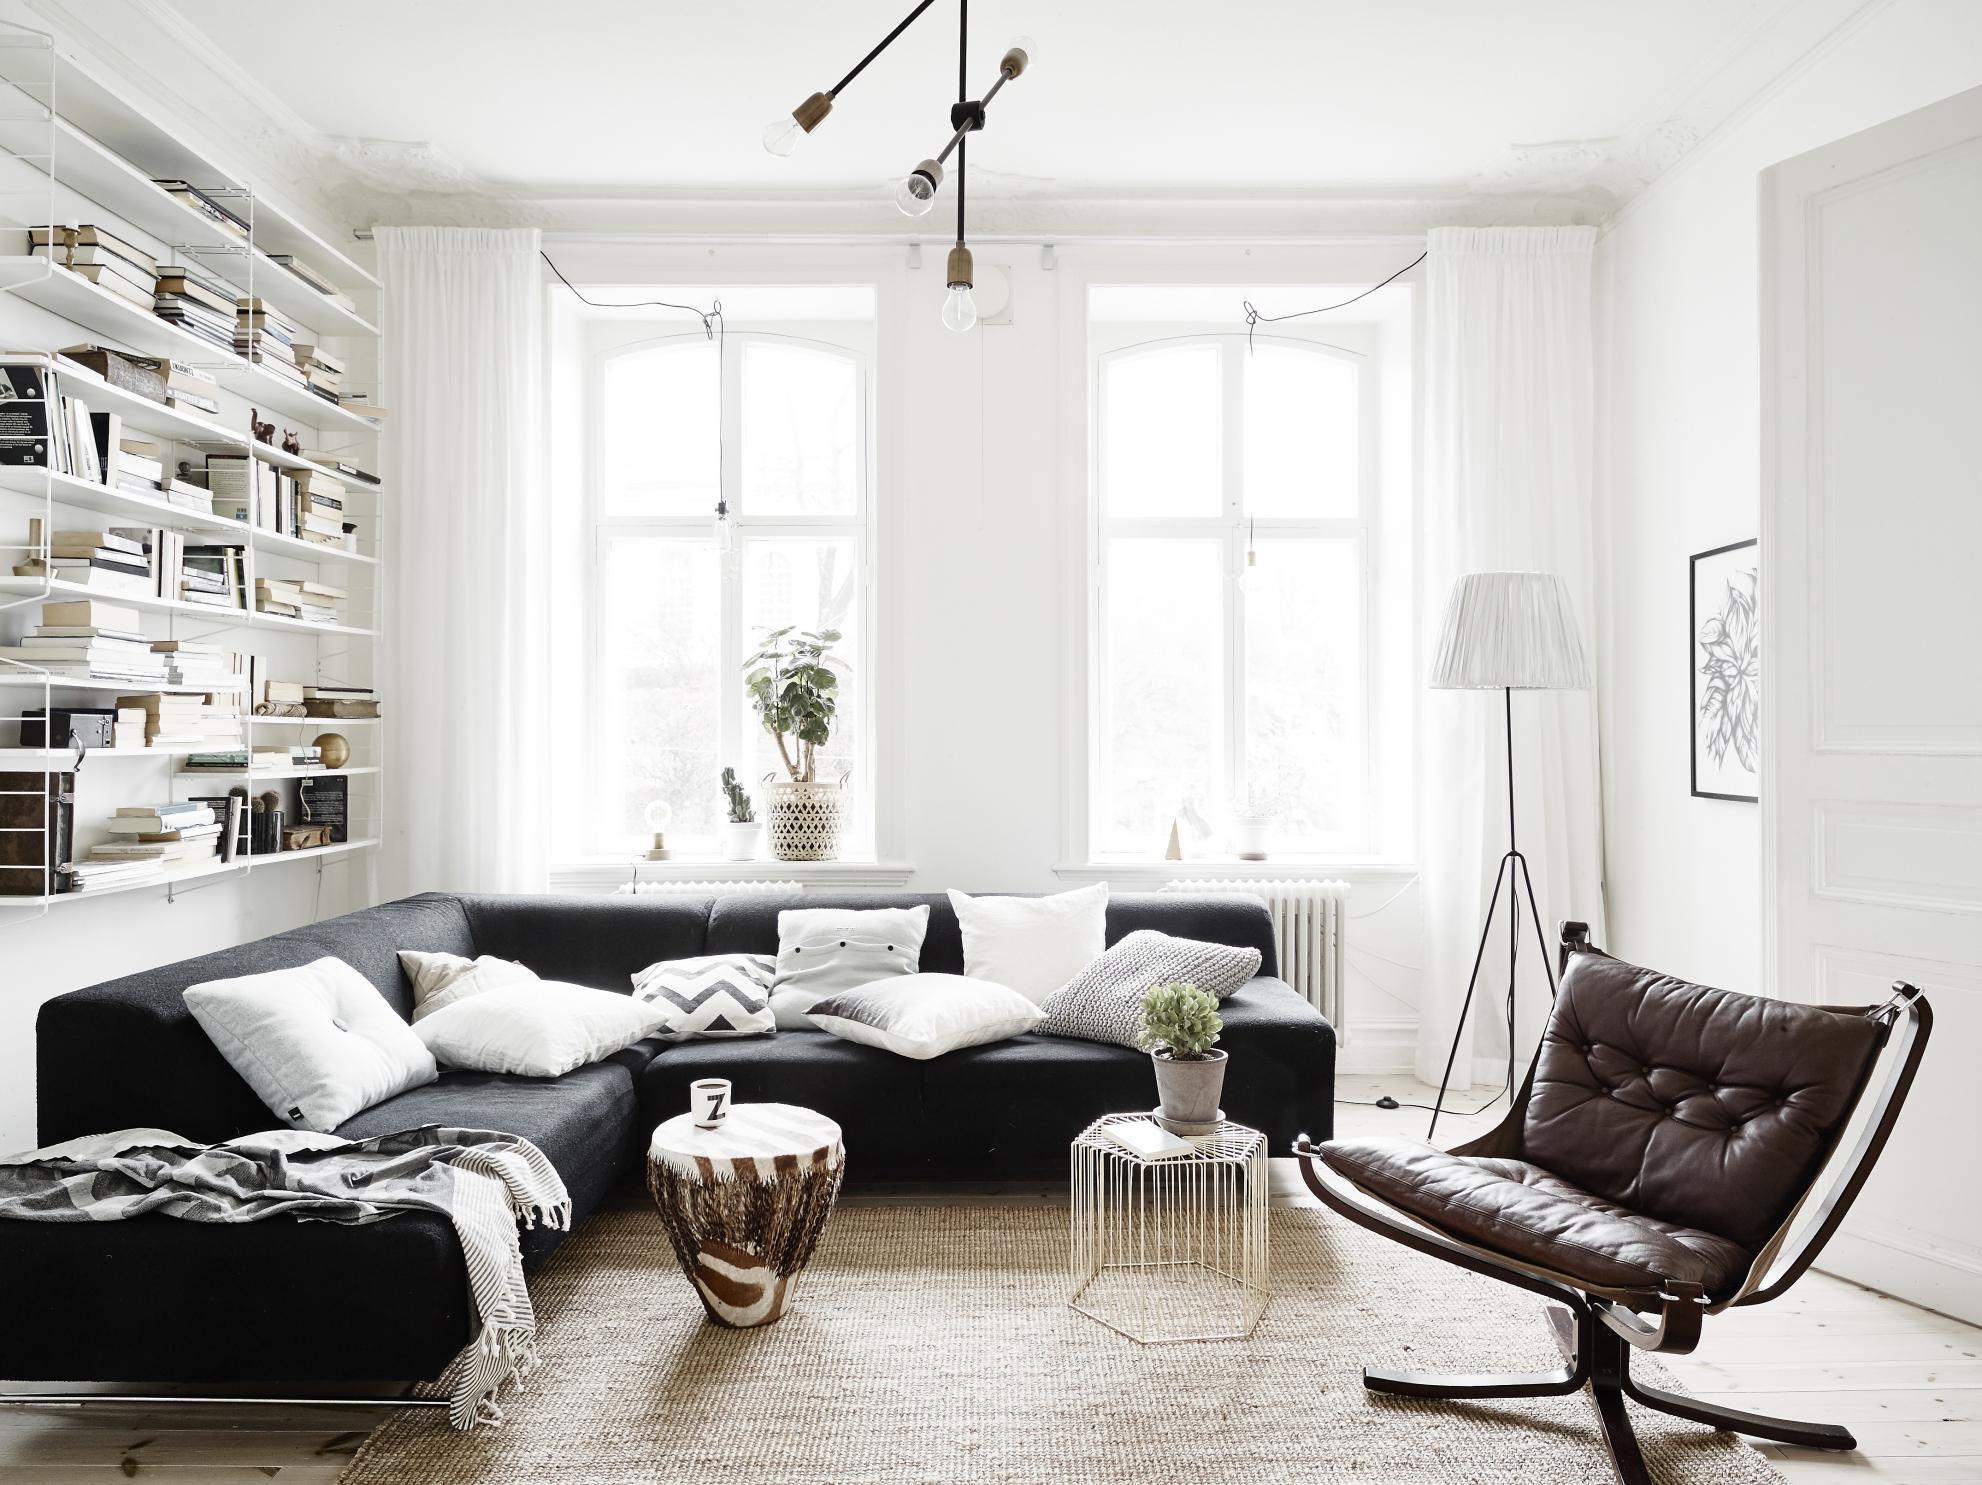 Eigentijds scandinavisch appartement homease - Eigentijdse stijl slaapkamer ...